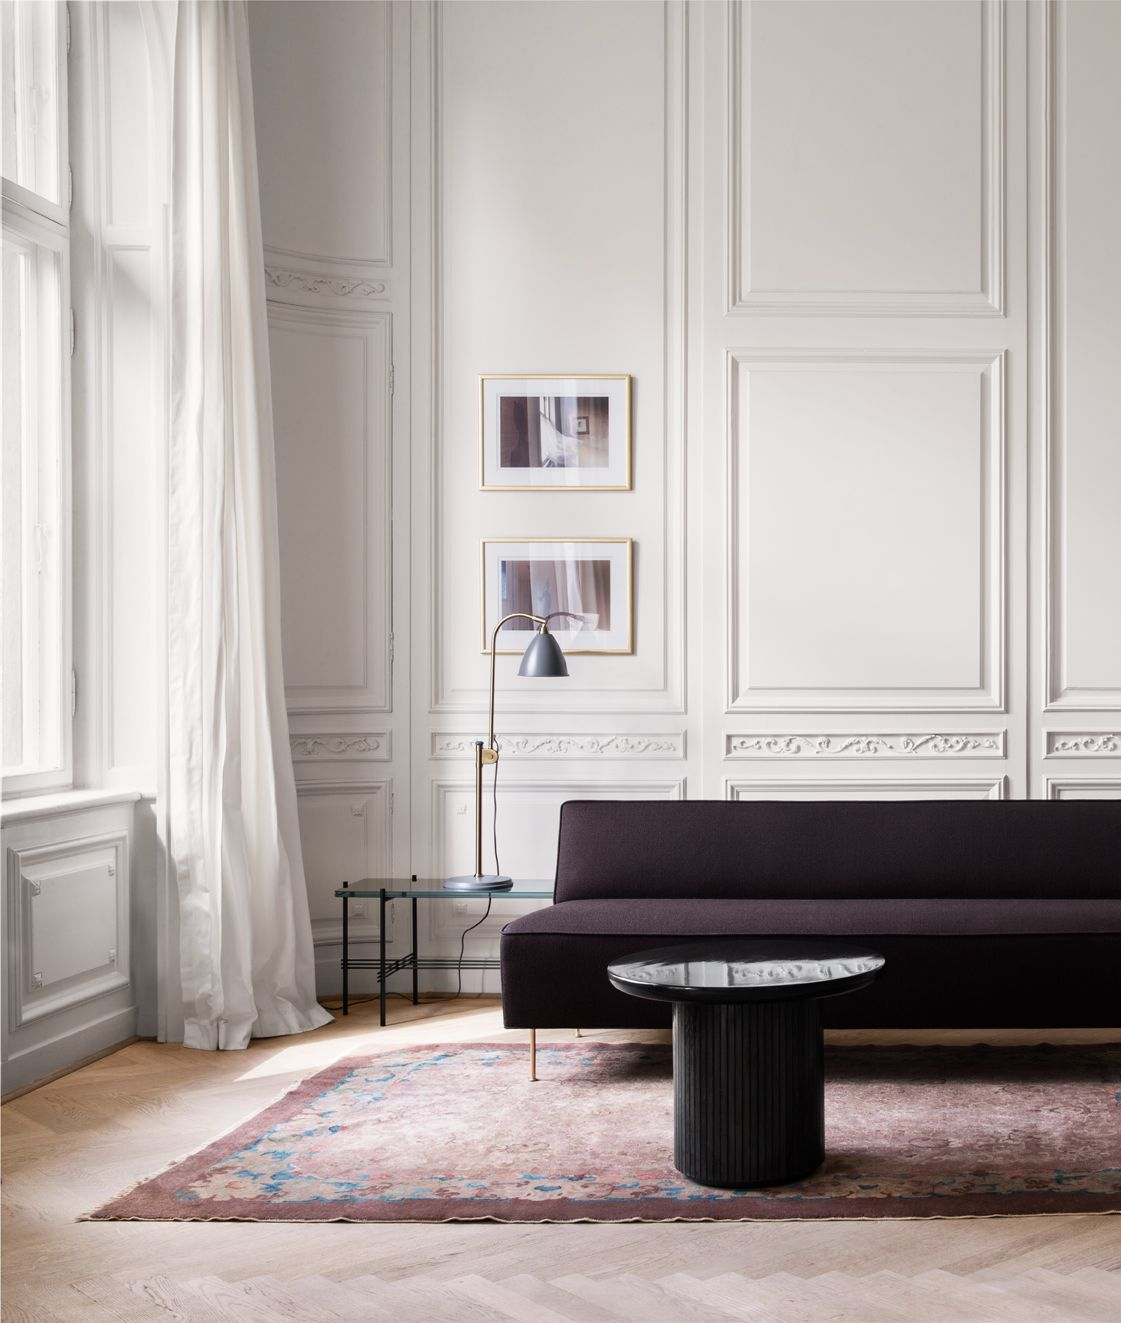 The Ultra Sleek Modern Line Sofa Designed By Greta Grossman In 1949 | DSHOP